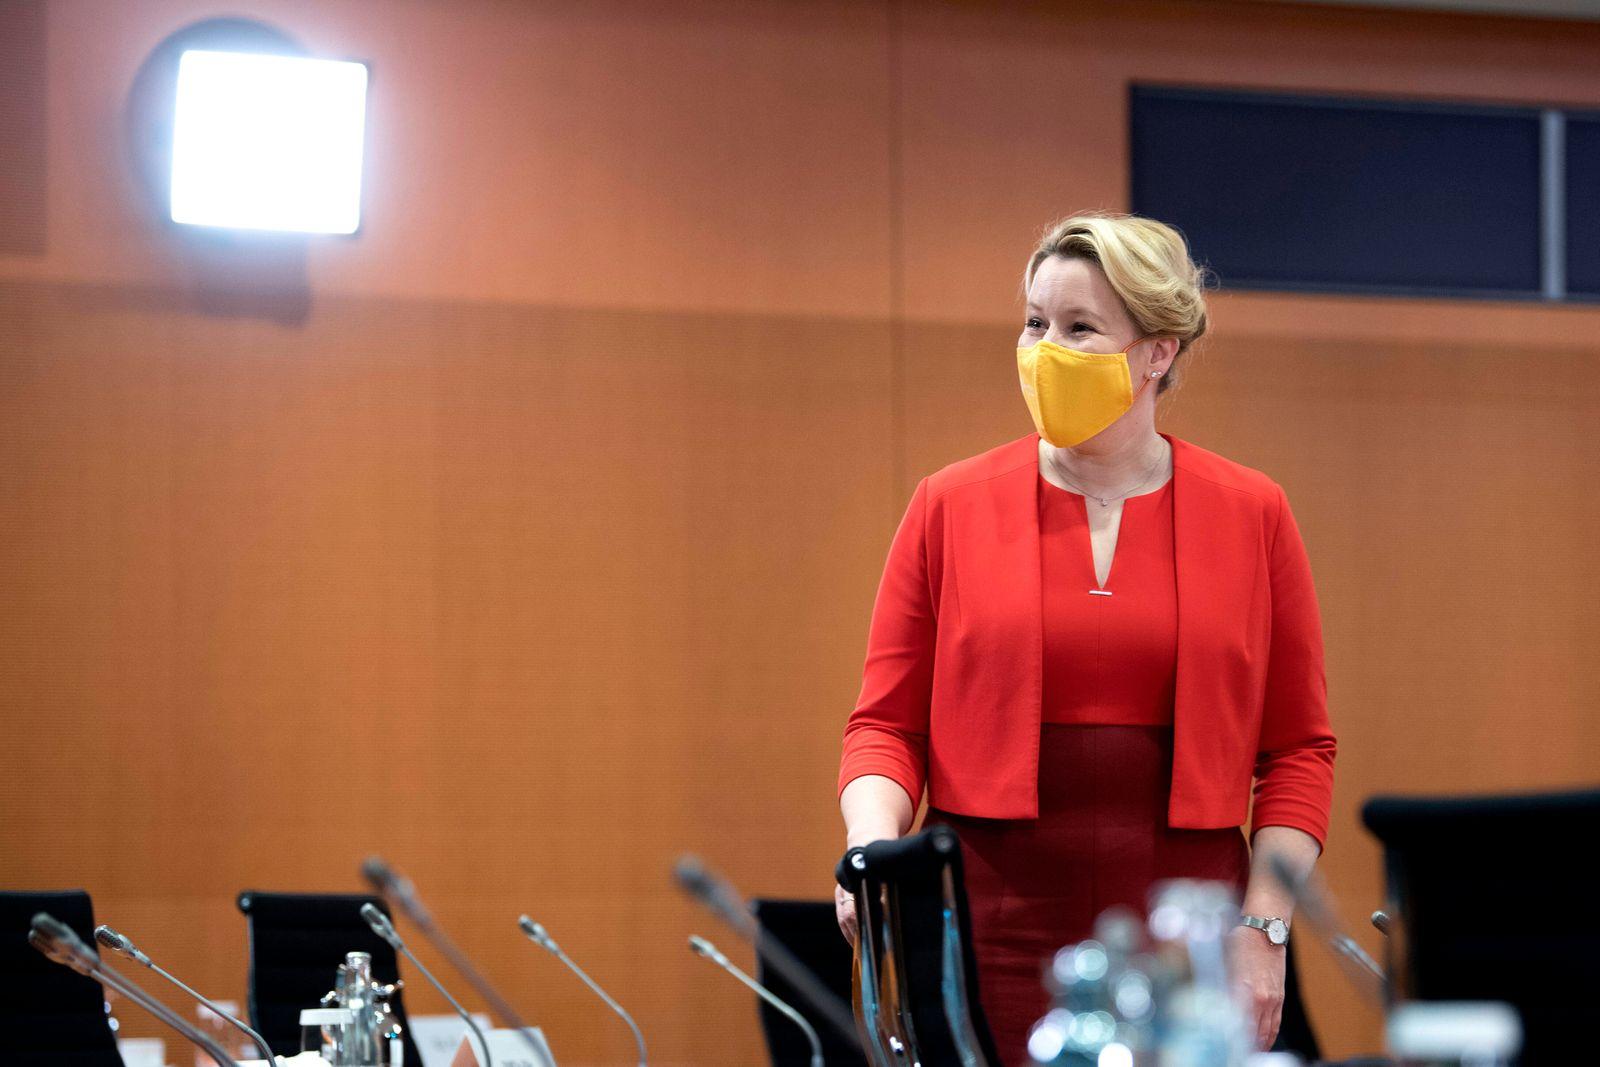 Franziska Giffey, Kabinett DEU, Deutschland, Germany, Berlin, 04.11.2020 Franziska Giffey, Bundesfamilienministerin SPD